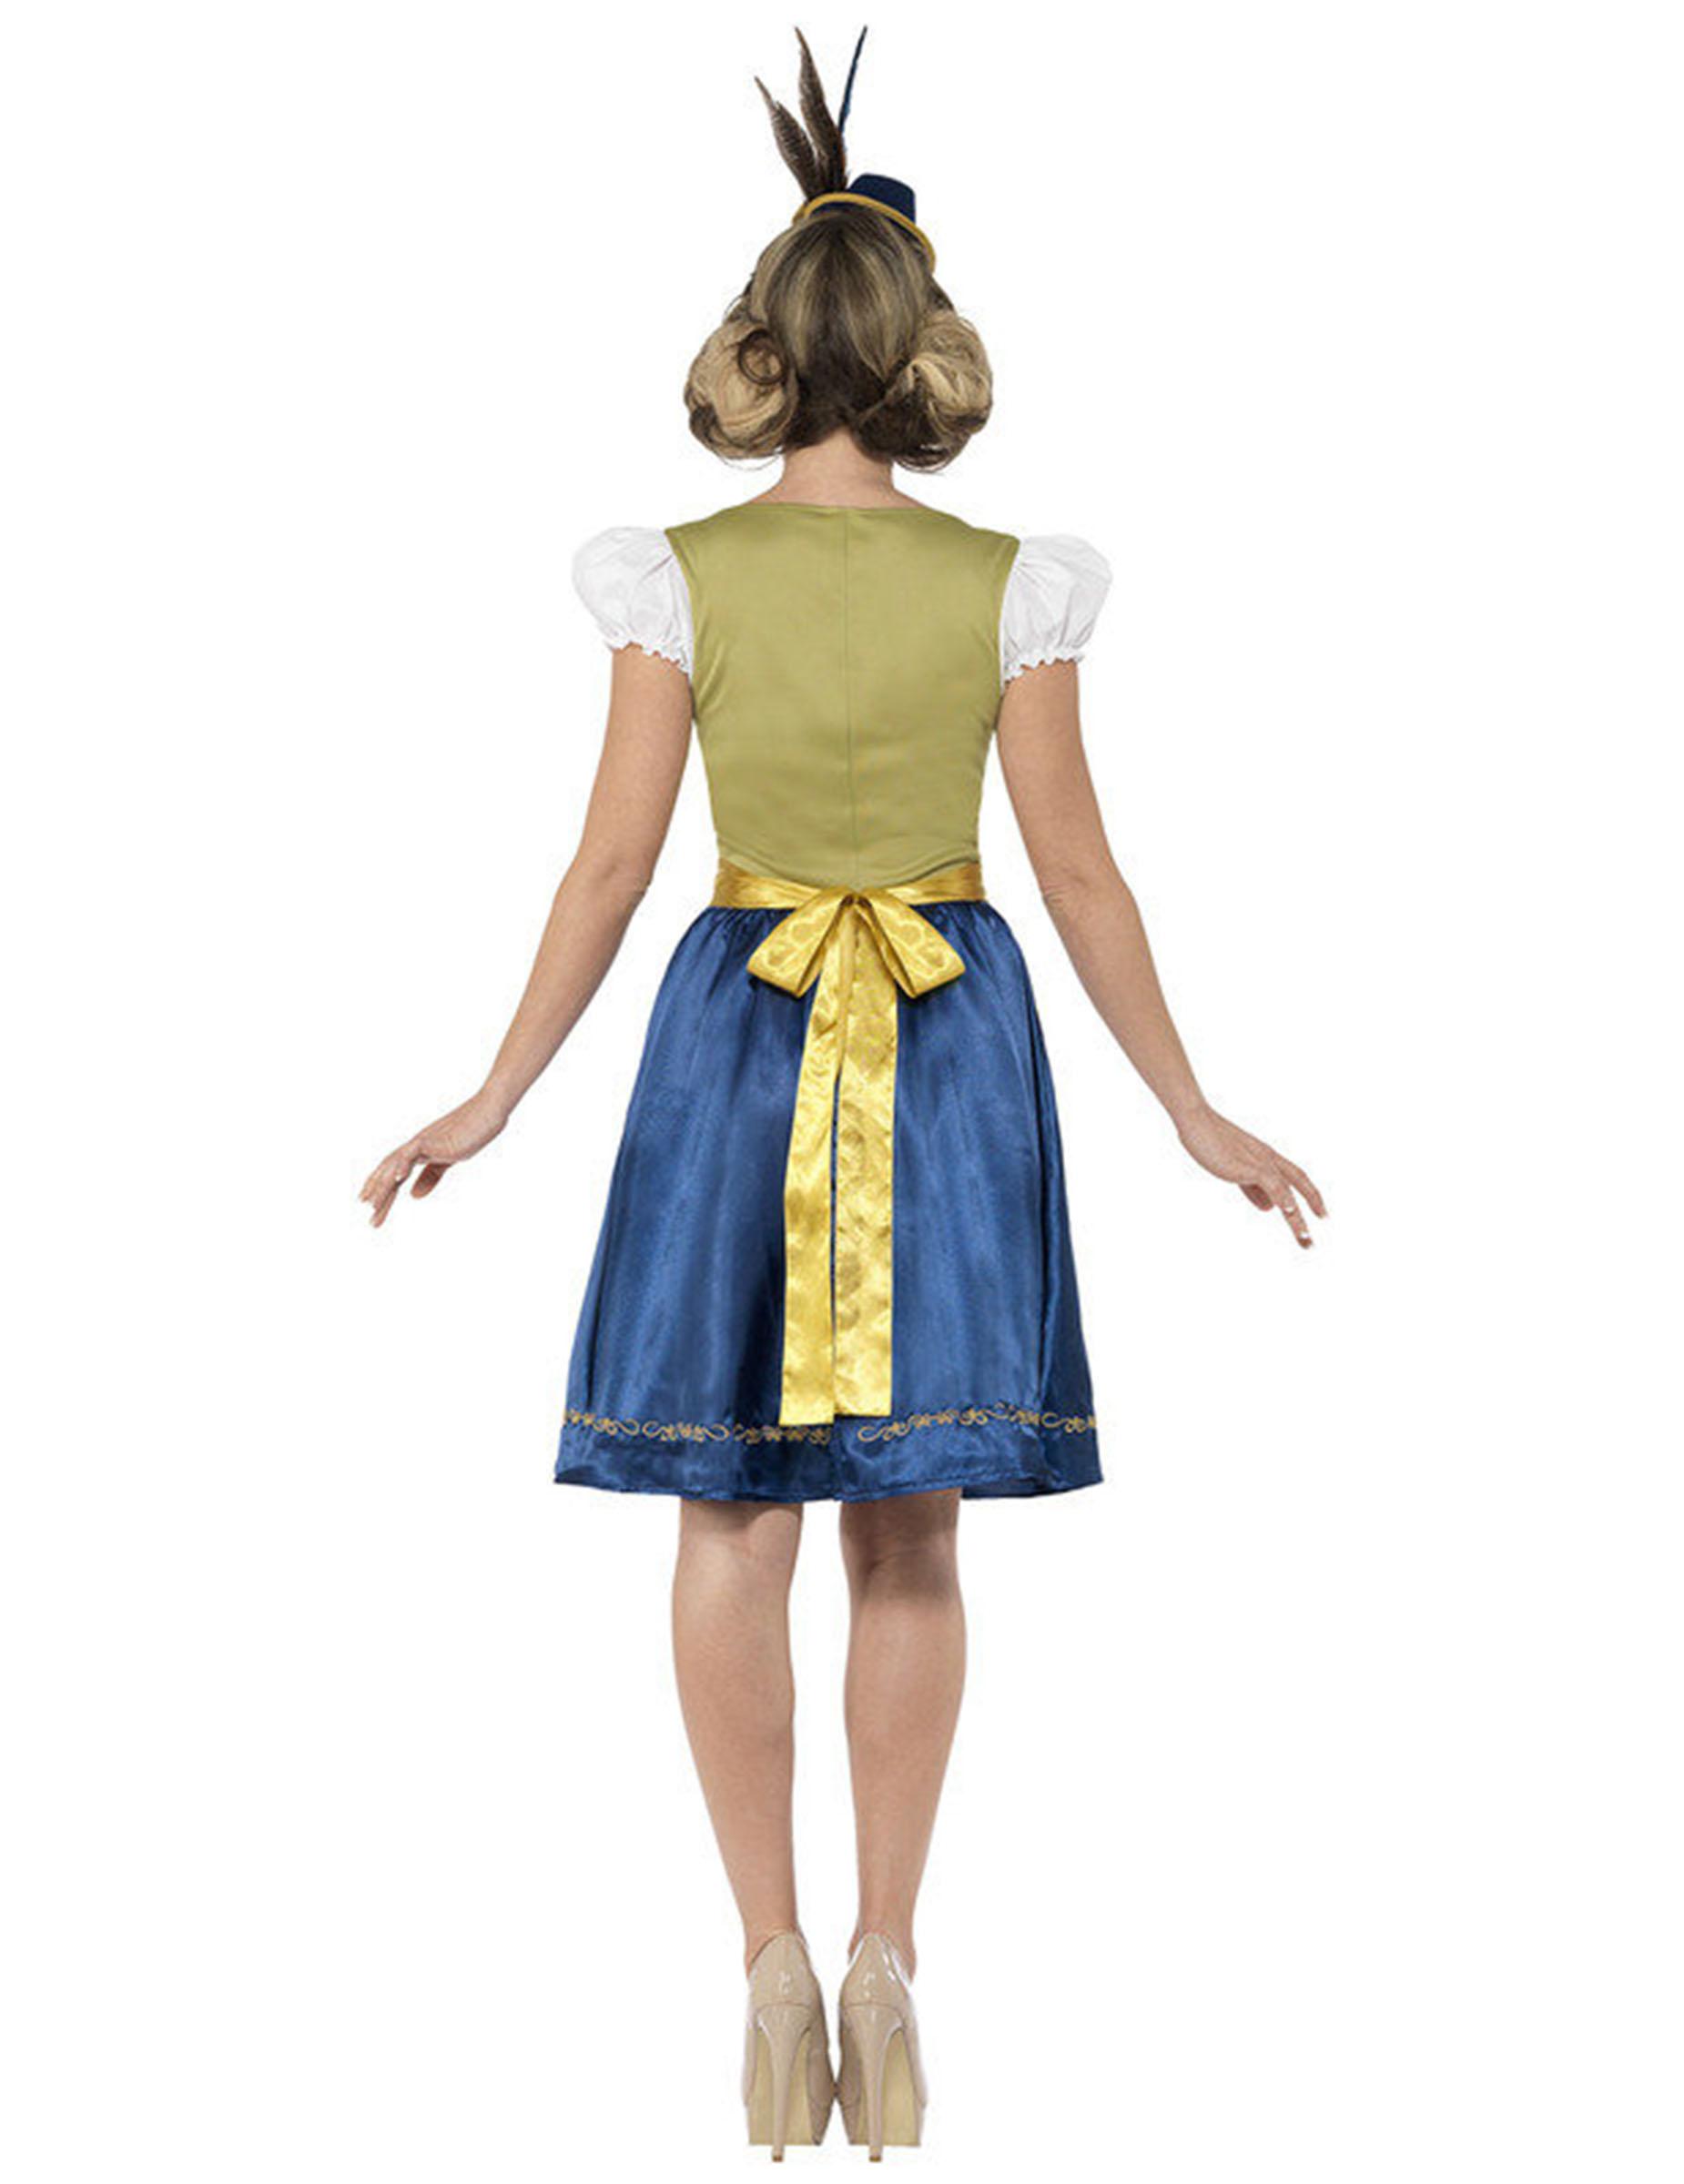 59c44ead5f73 Kostume dirndl kjole grøn-brun-blå-2